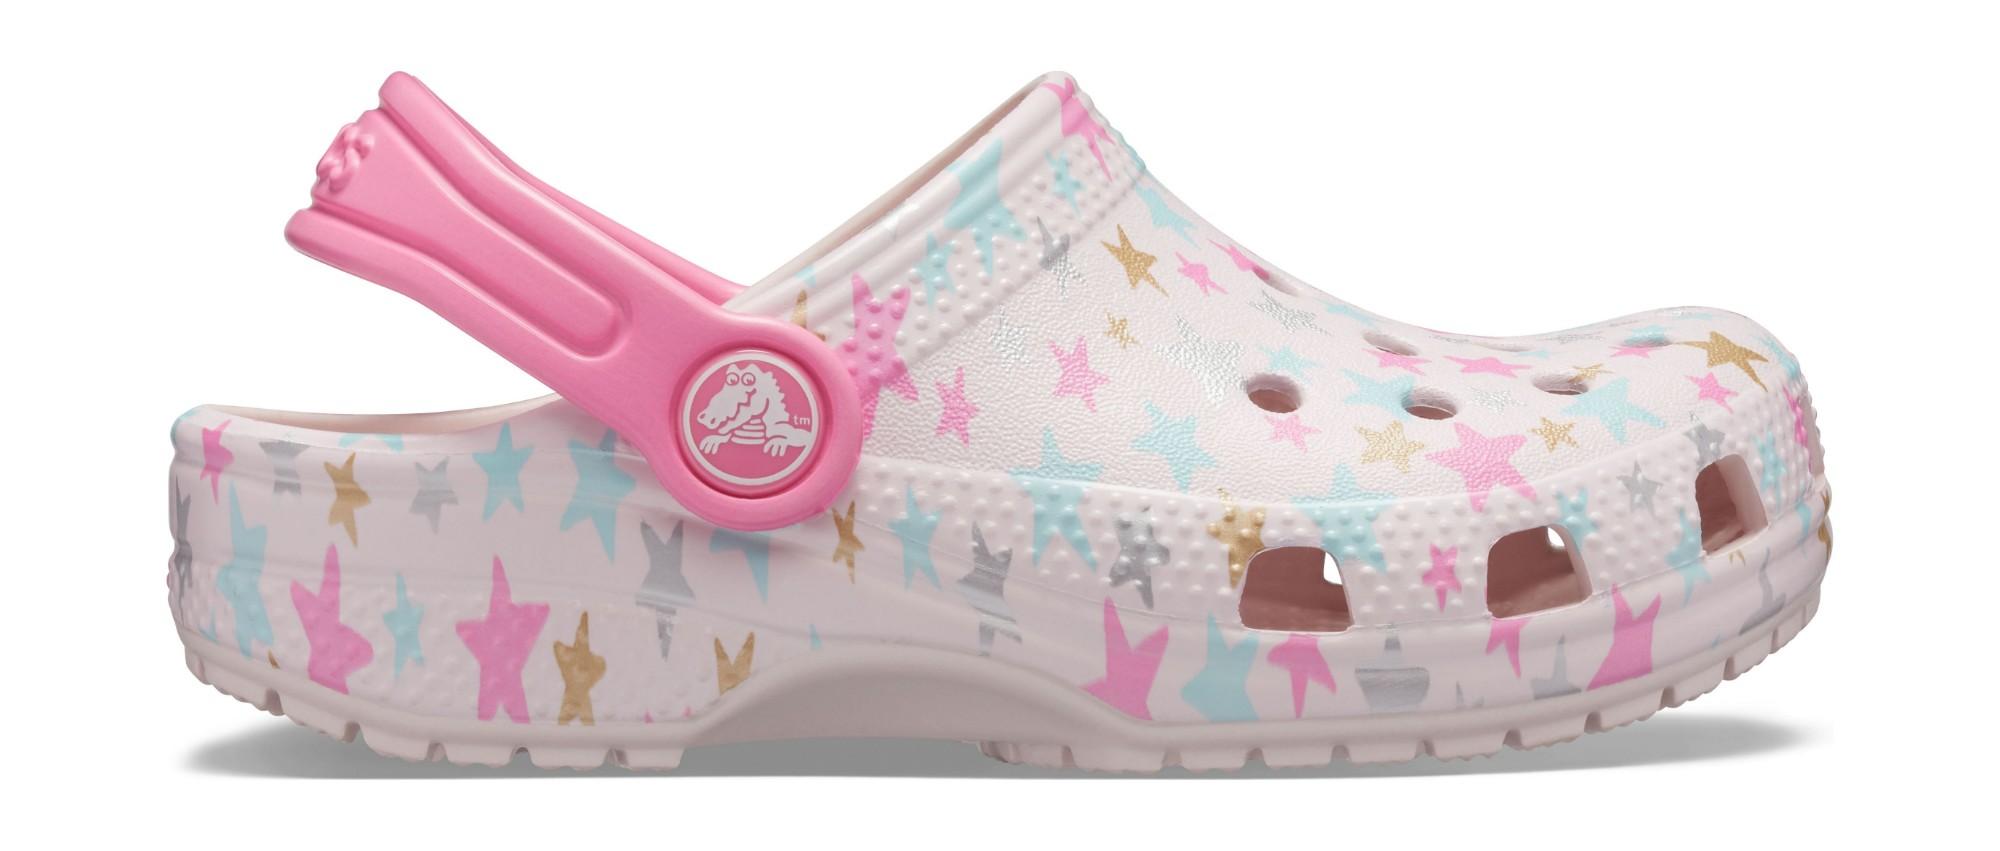 Crocs™ Classic Printed Clog Kid's Barely Pink 33,5